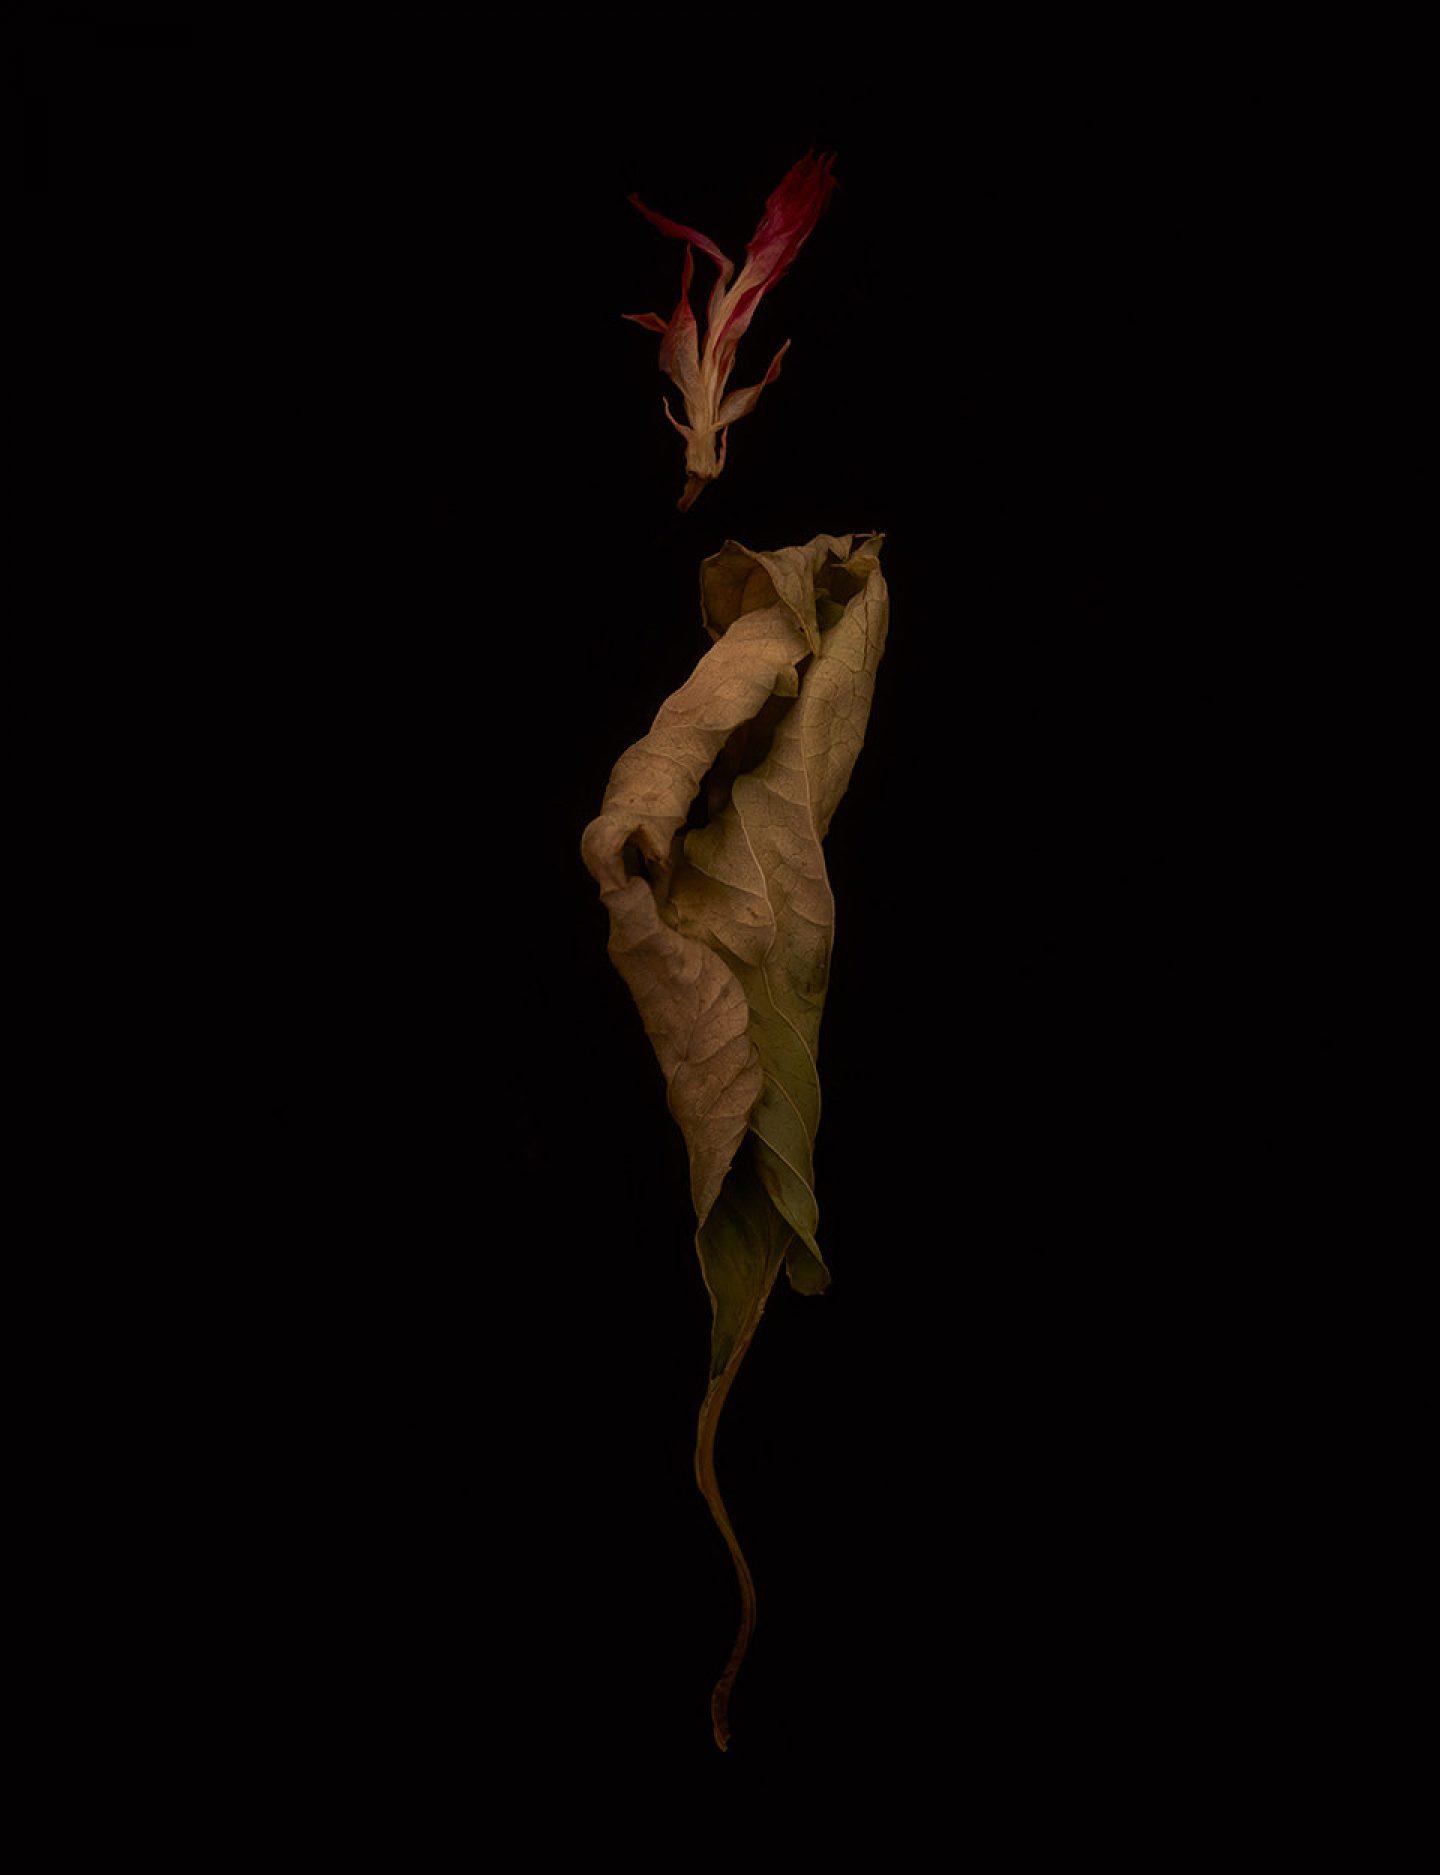 IGNANT-Photography-Gruenberger-ALetterToAFriend-17